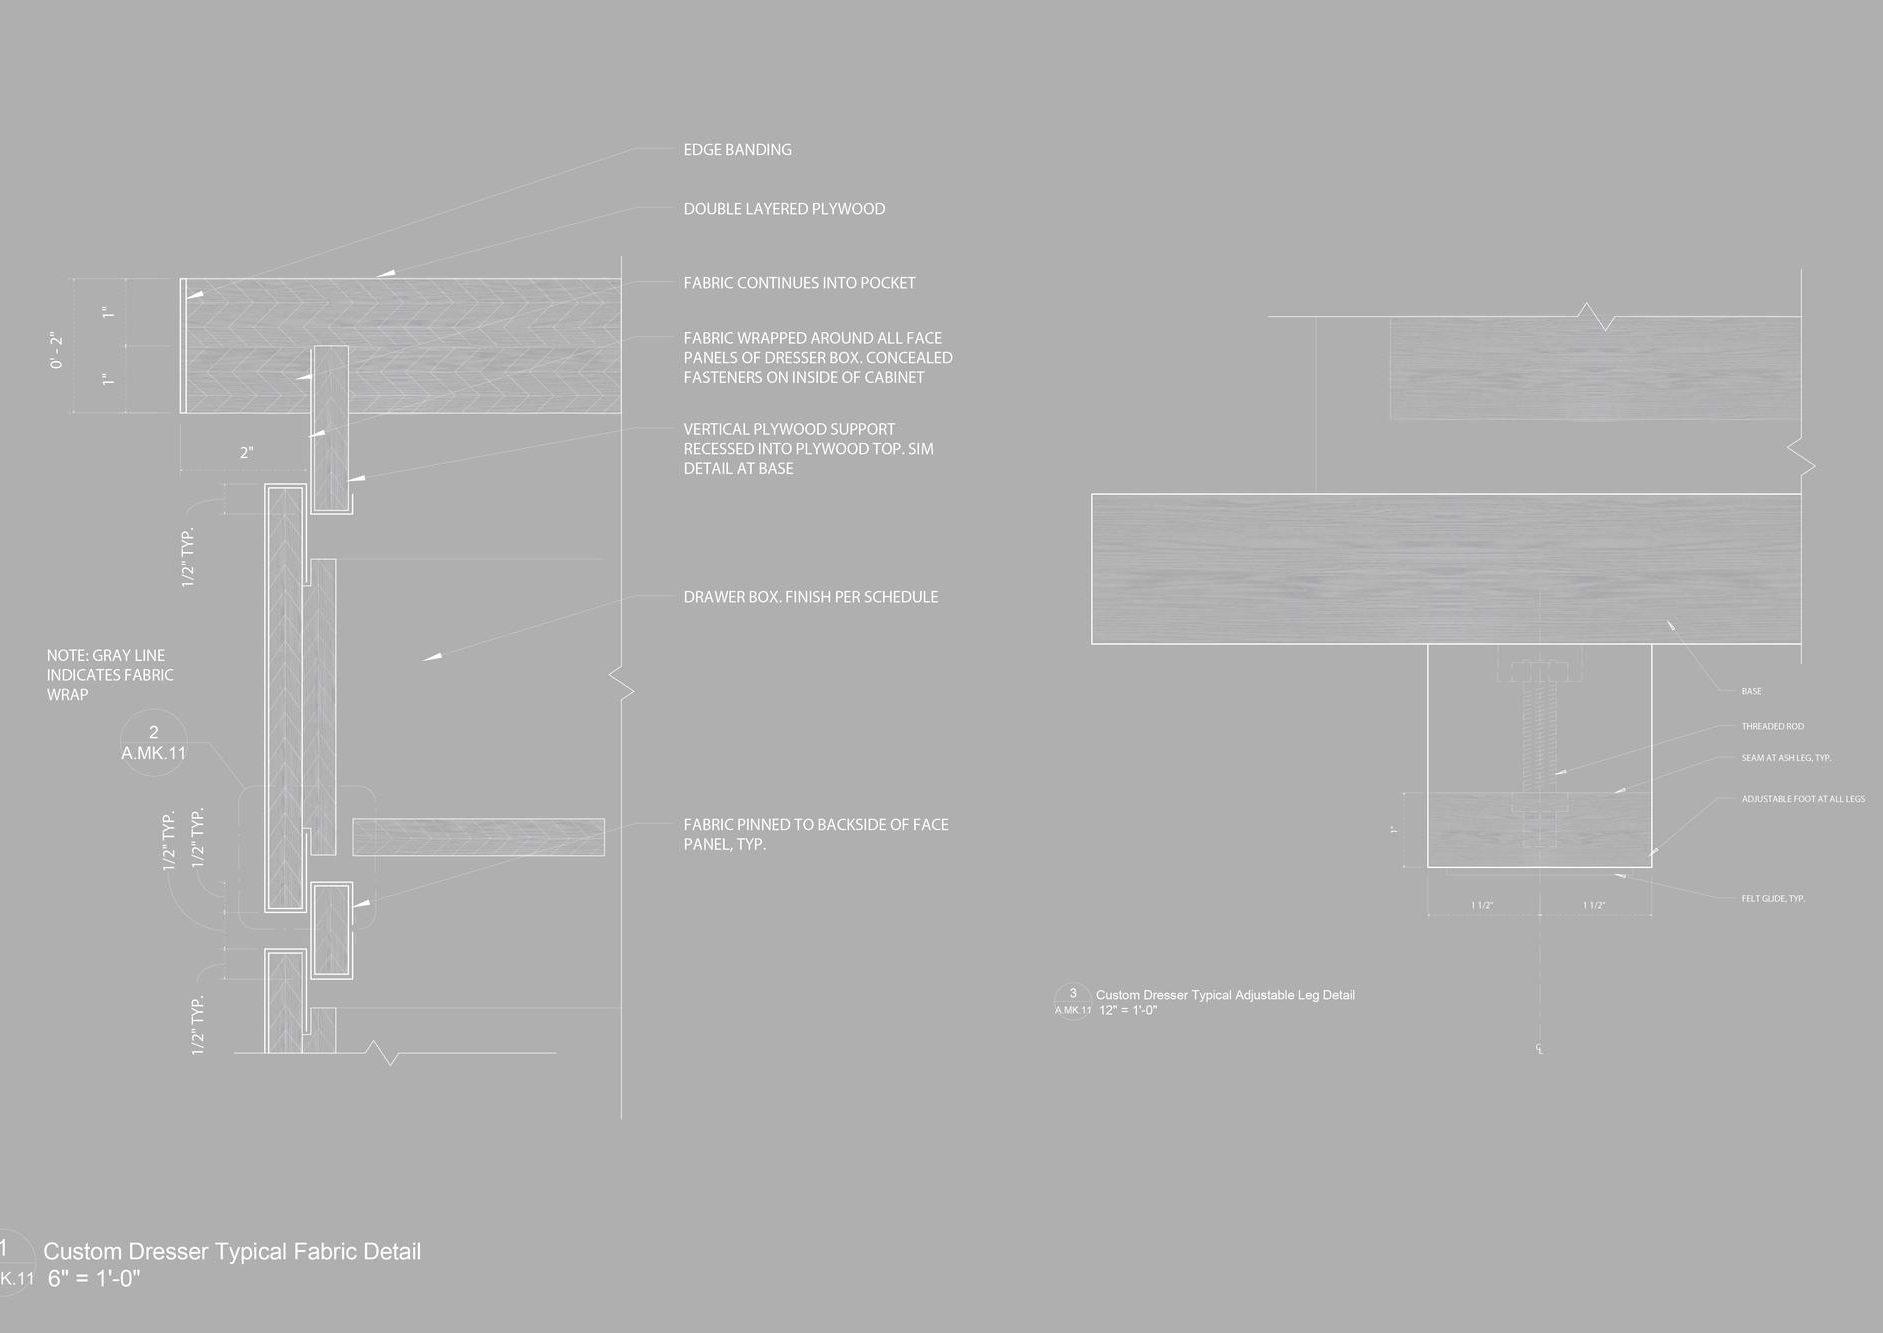 DRESSER-FOR-WEBSITE-DETAIL-01-1883x1333 strategic design consultancy